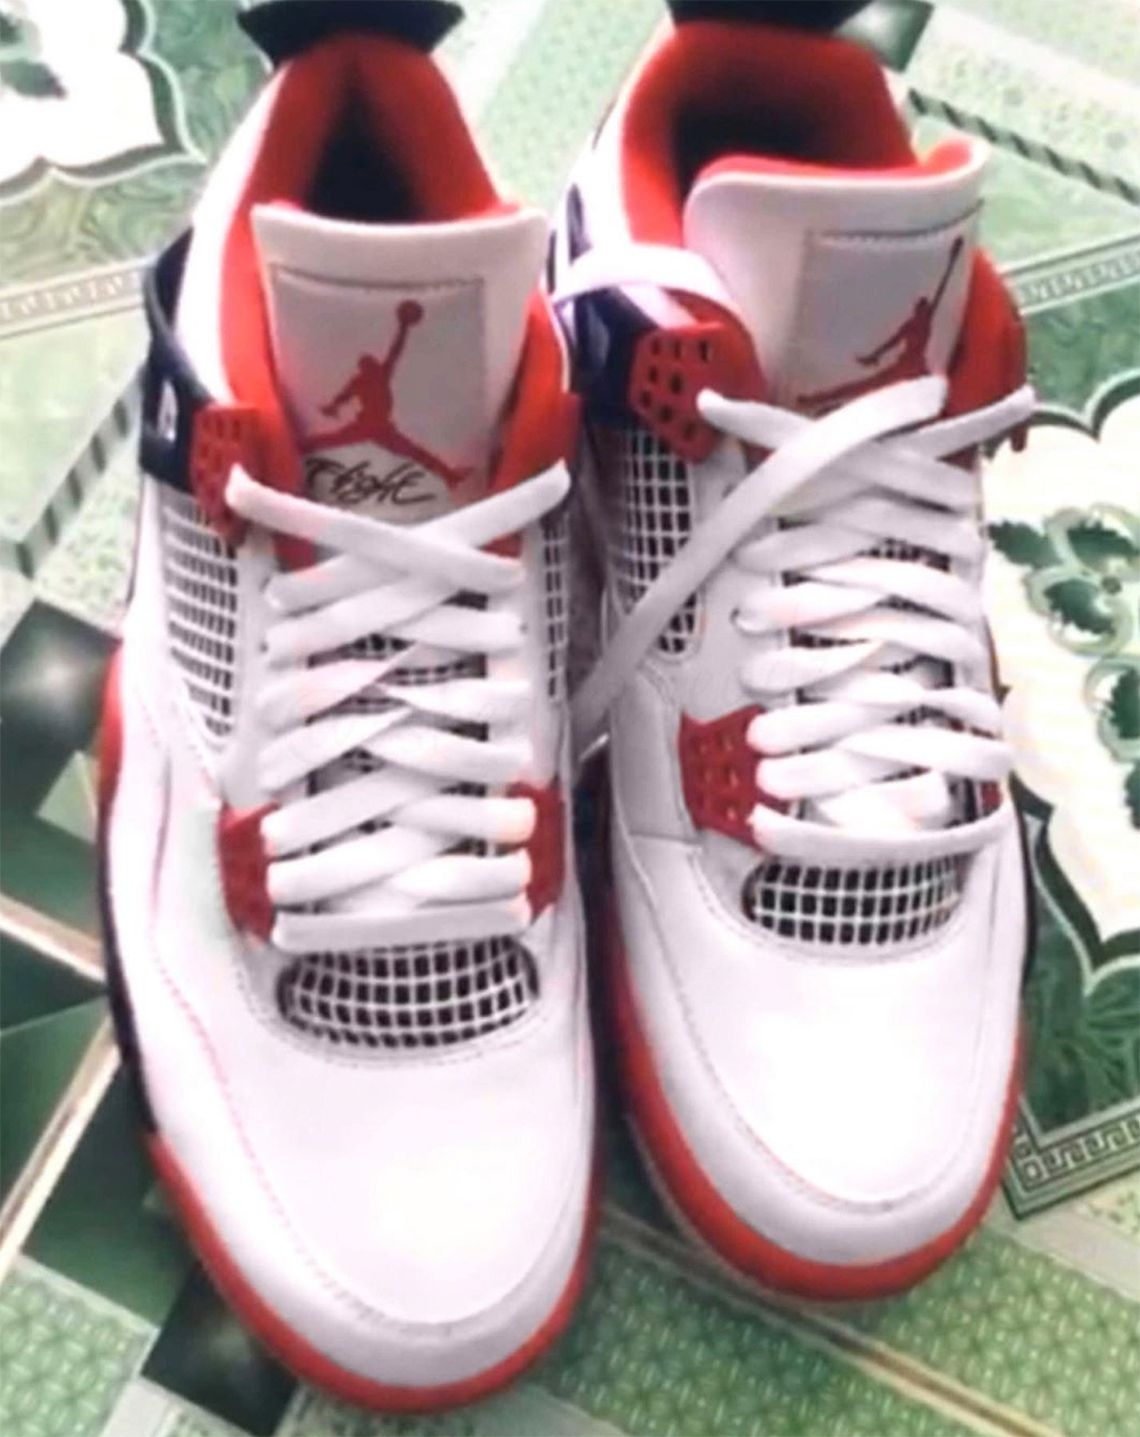 First Look At The Air Jordan 4 Fire Red Releasing Black Friday 2020 In 2020 Air Jordans Air Jordans Retro Sneakers